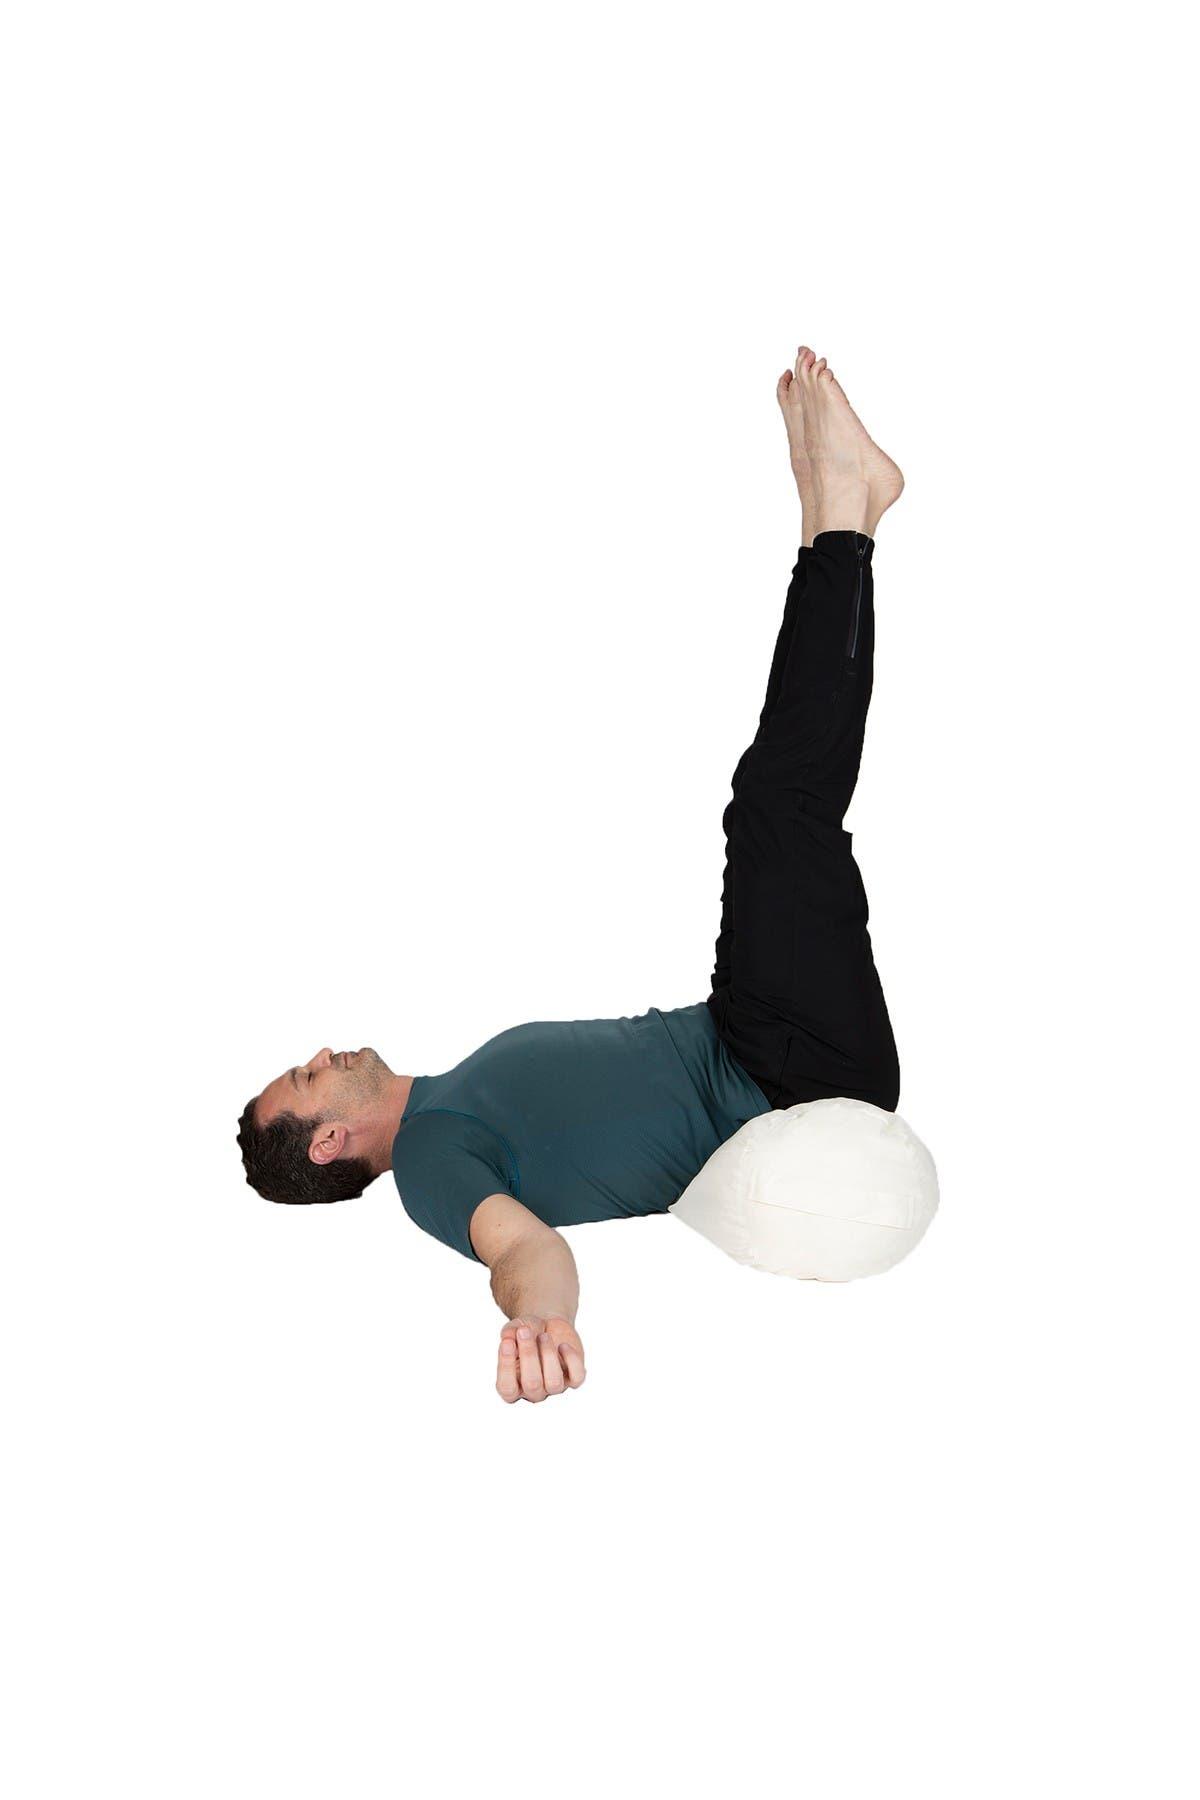 Image of MIND READER Meditation & Restorative Yoga Pillow/Cushion